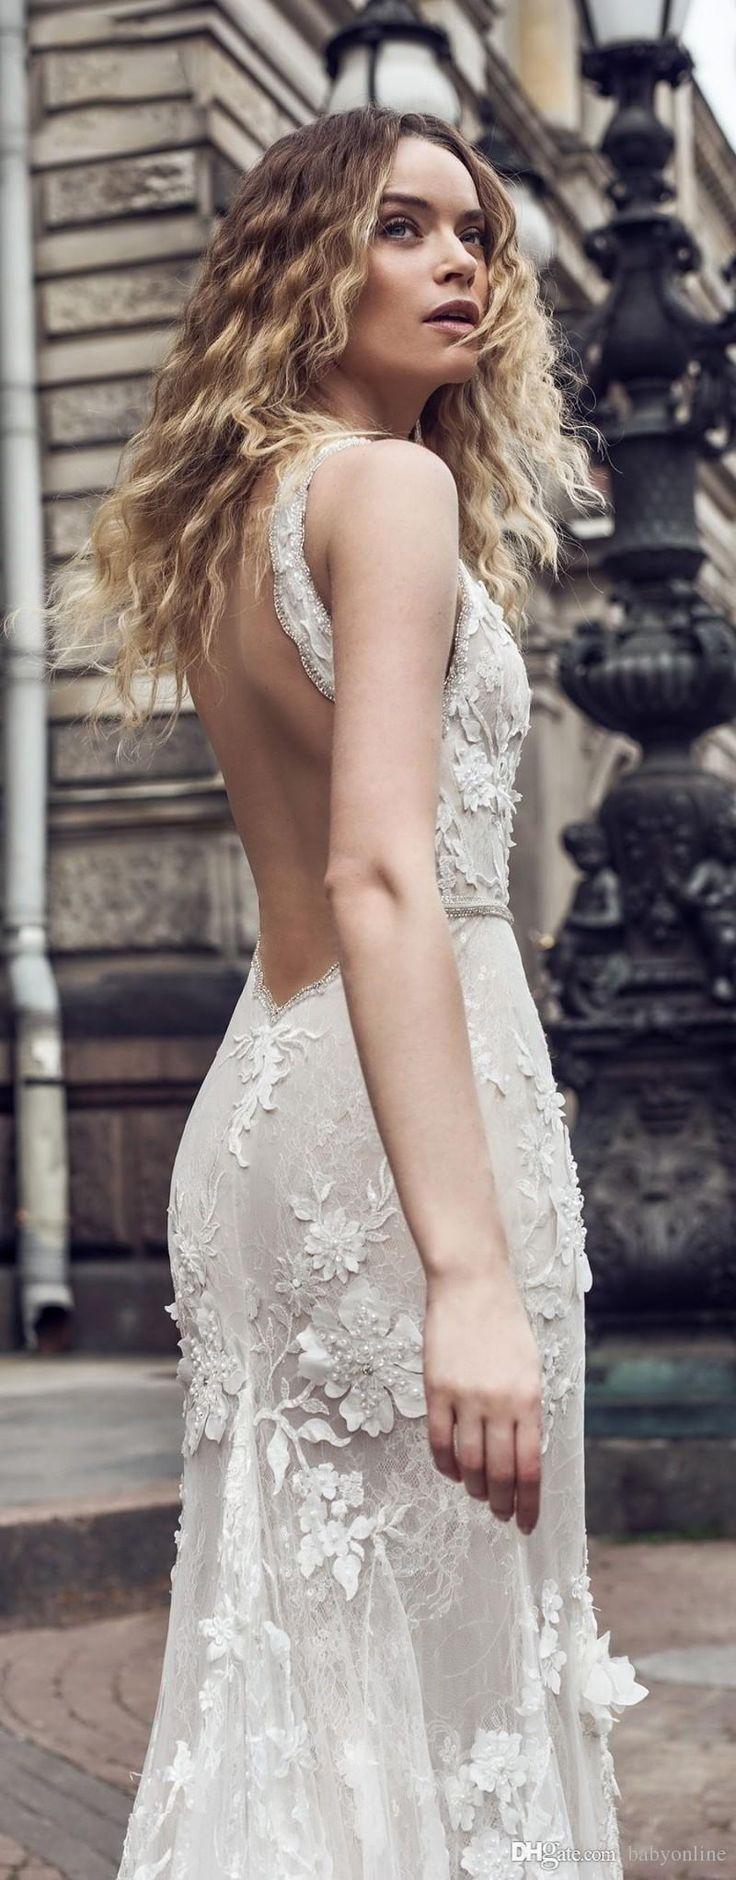 2018 Sexy Bohemian Deep V-Neck Mermaid Wedding Dresses Lace 3D-Floral Appliques Backless Long Train Charming Bridal Gowns Vestidos de novia